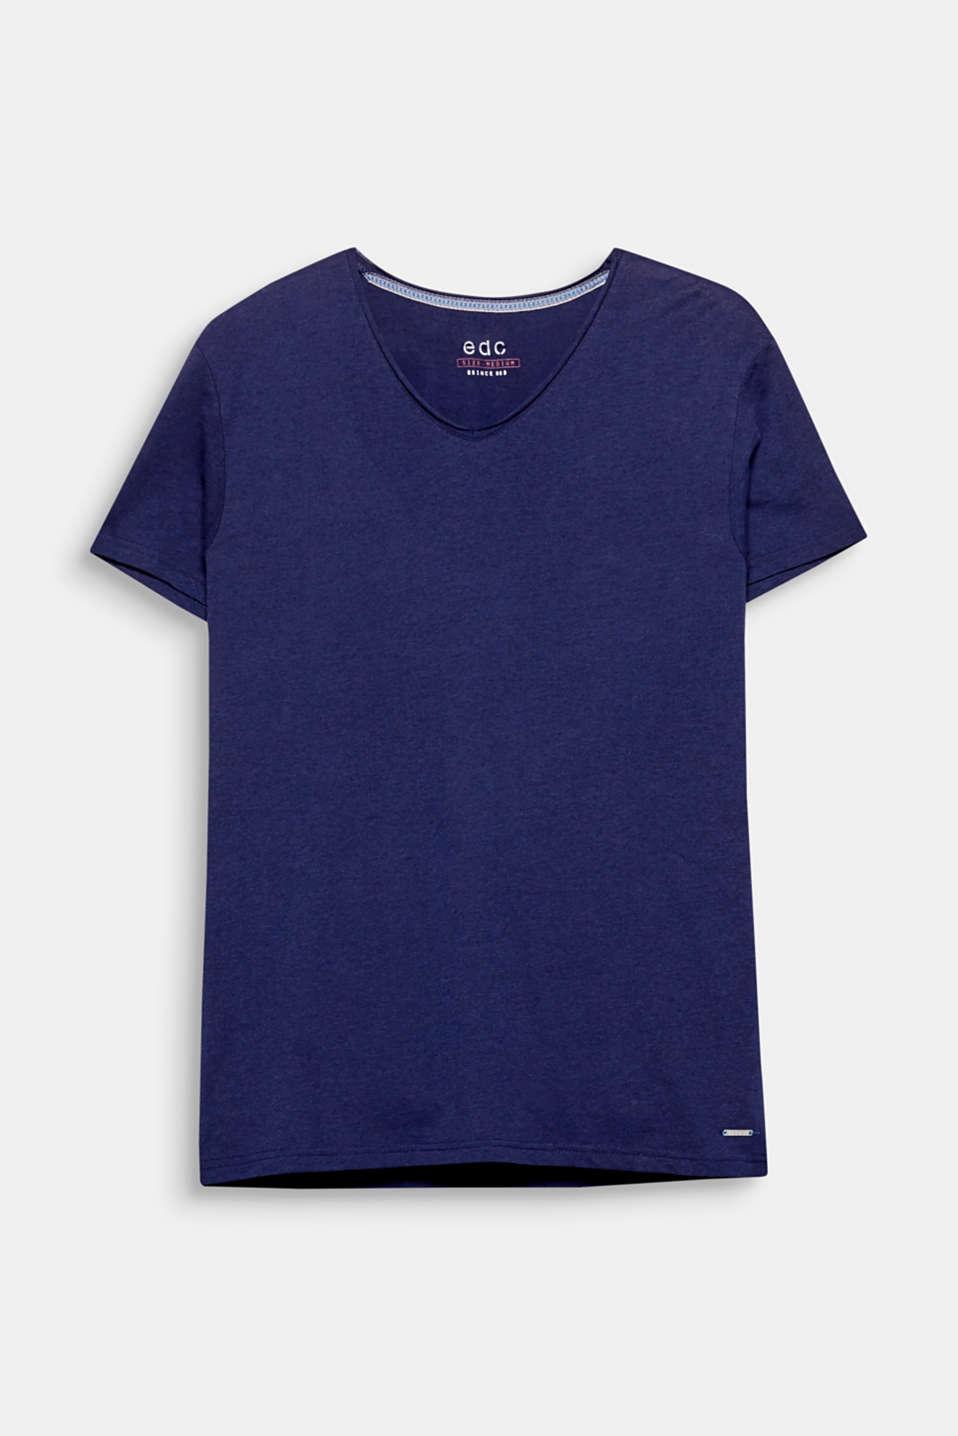 edc basic jersey T shirt, 100% cotton at our Online Shop